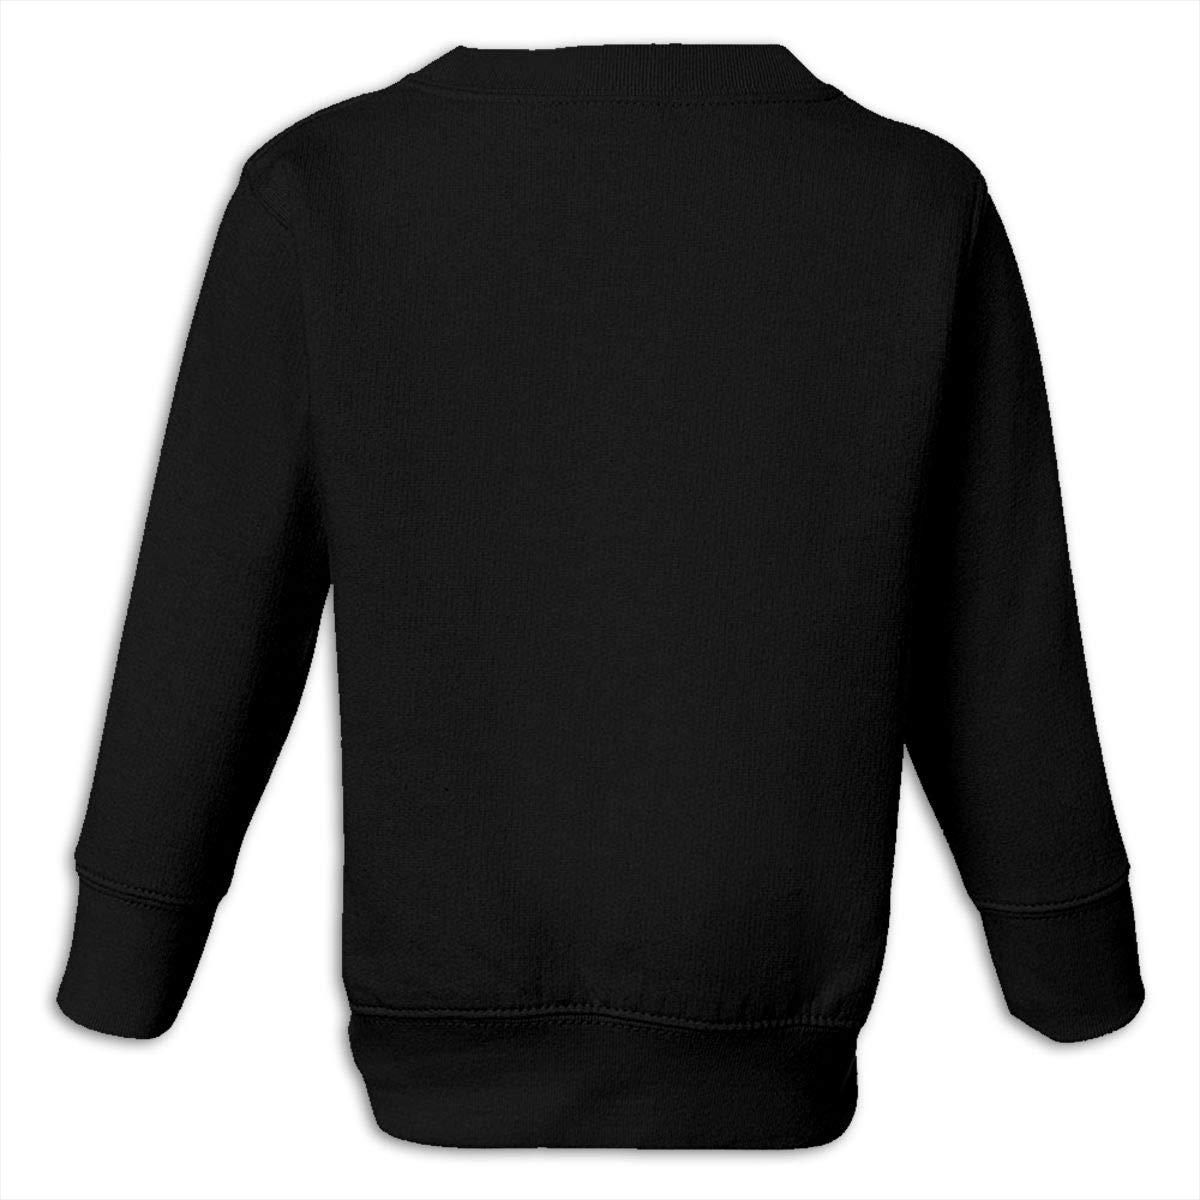 Yuliang Unanimous Girl Fashion Sweater Black